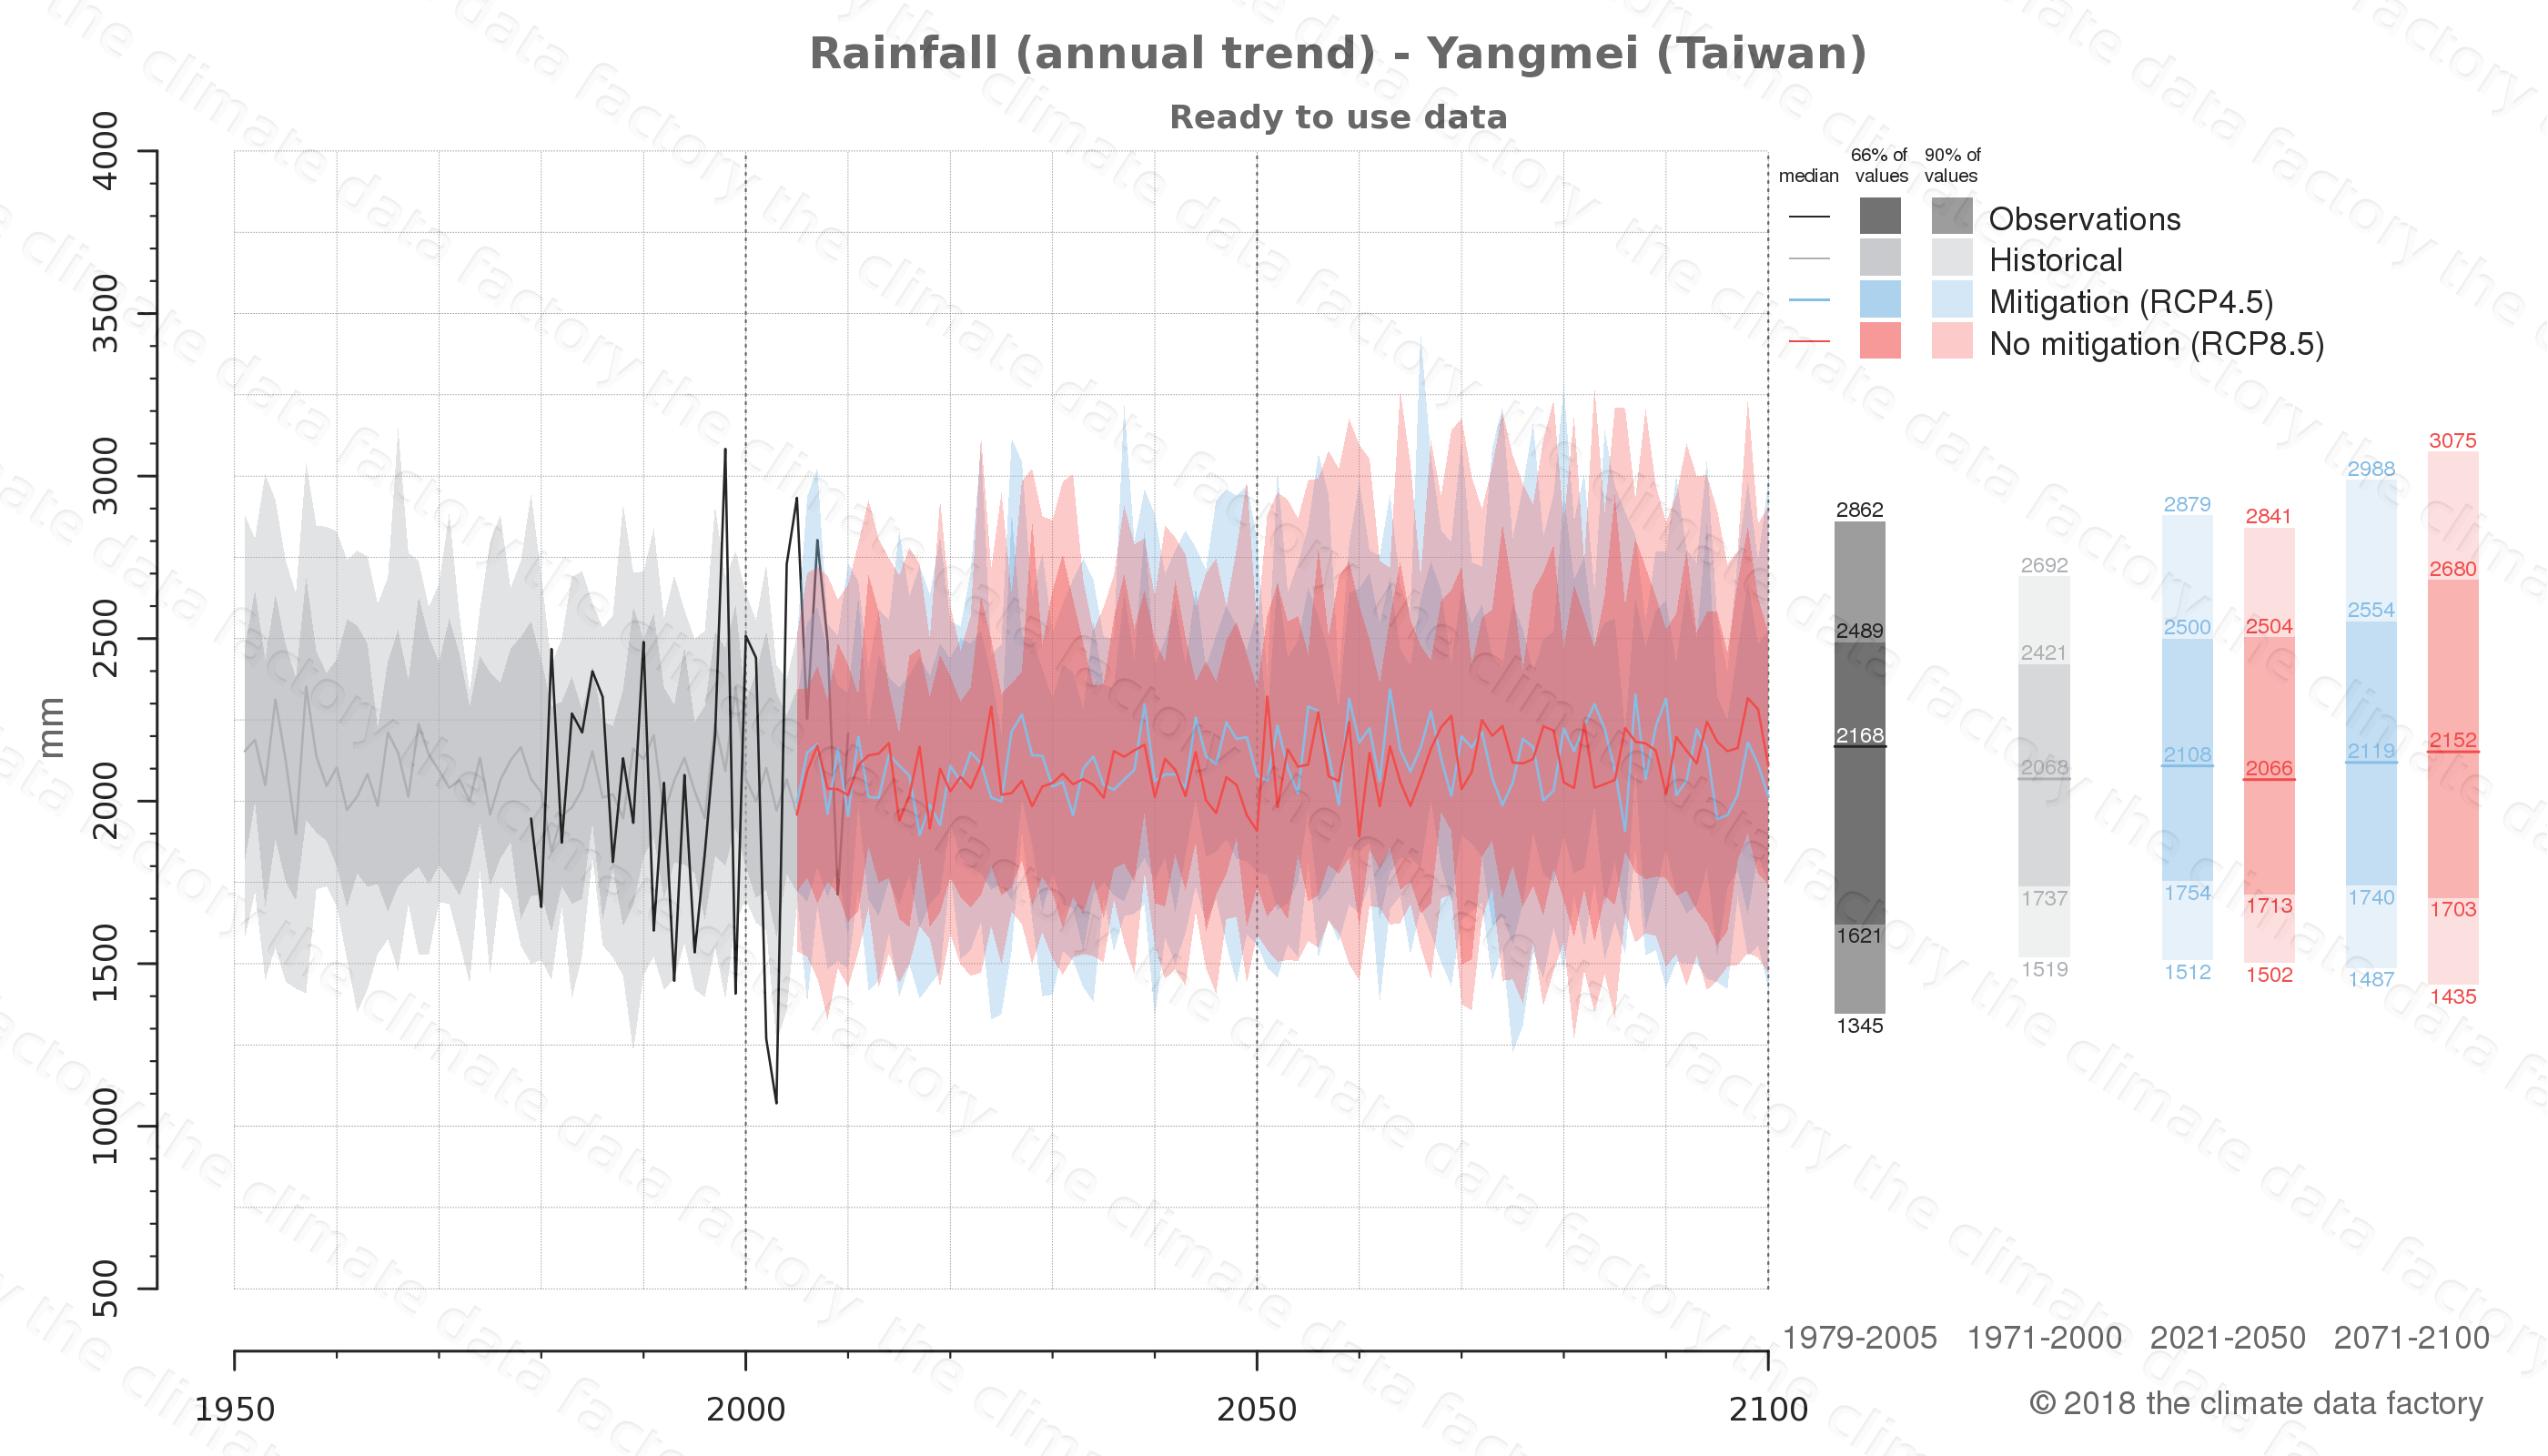 climate change data policy adaptation climate graph city data rainfall yangmei taiwan